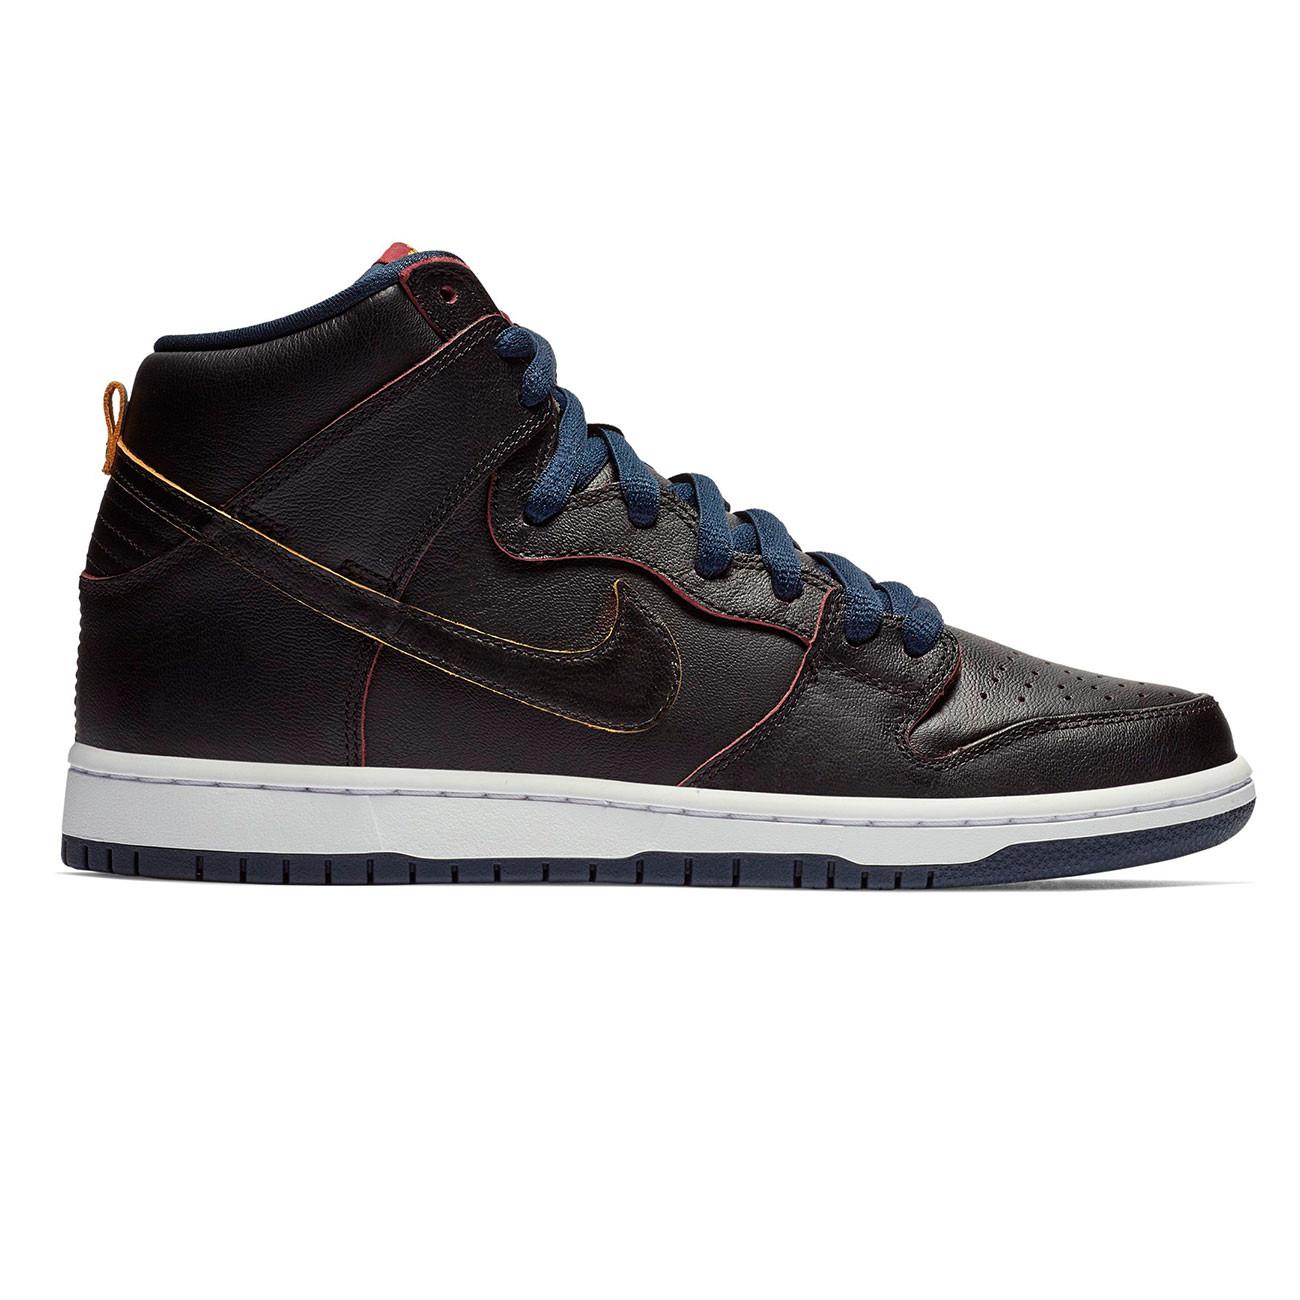 Tenisky Nike SB Dunk High Pro NBA black black-college navy-team rd ... daf5eb3007